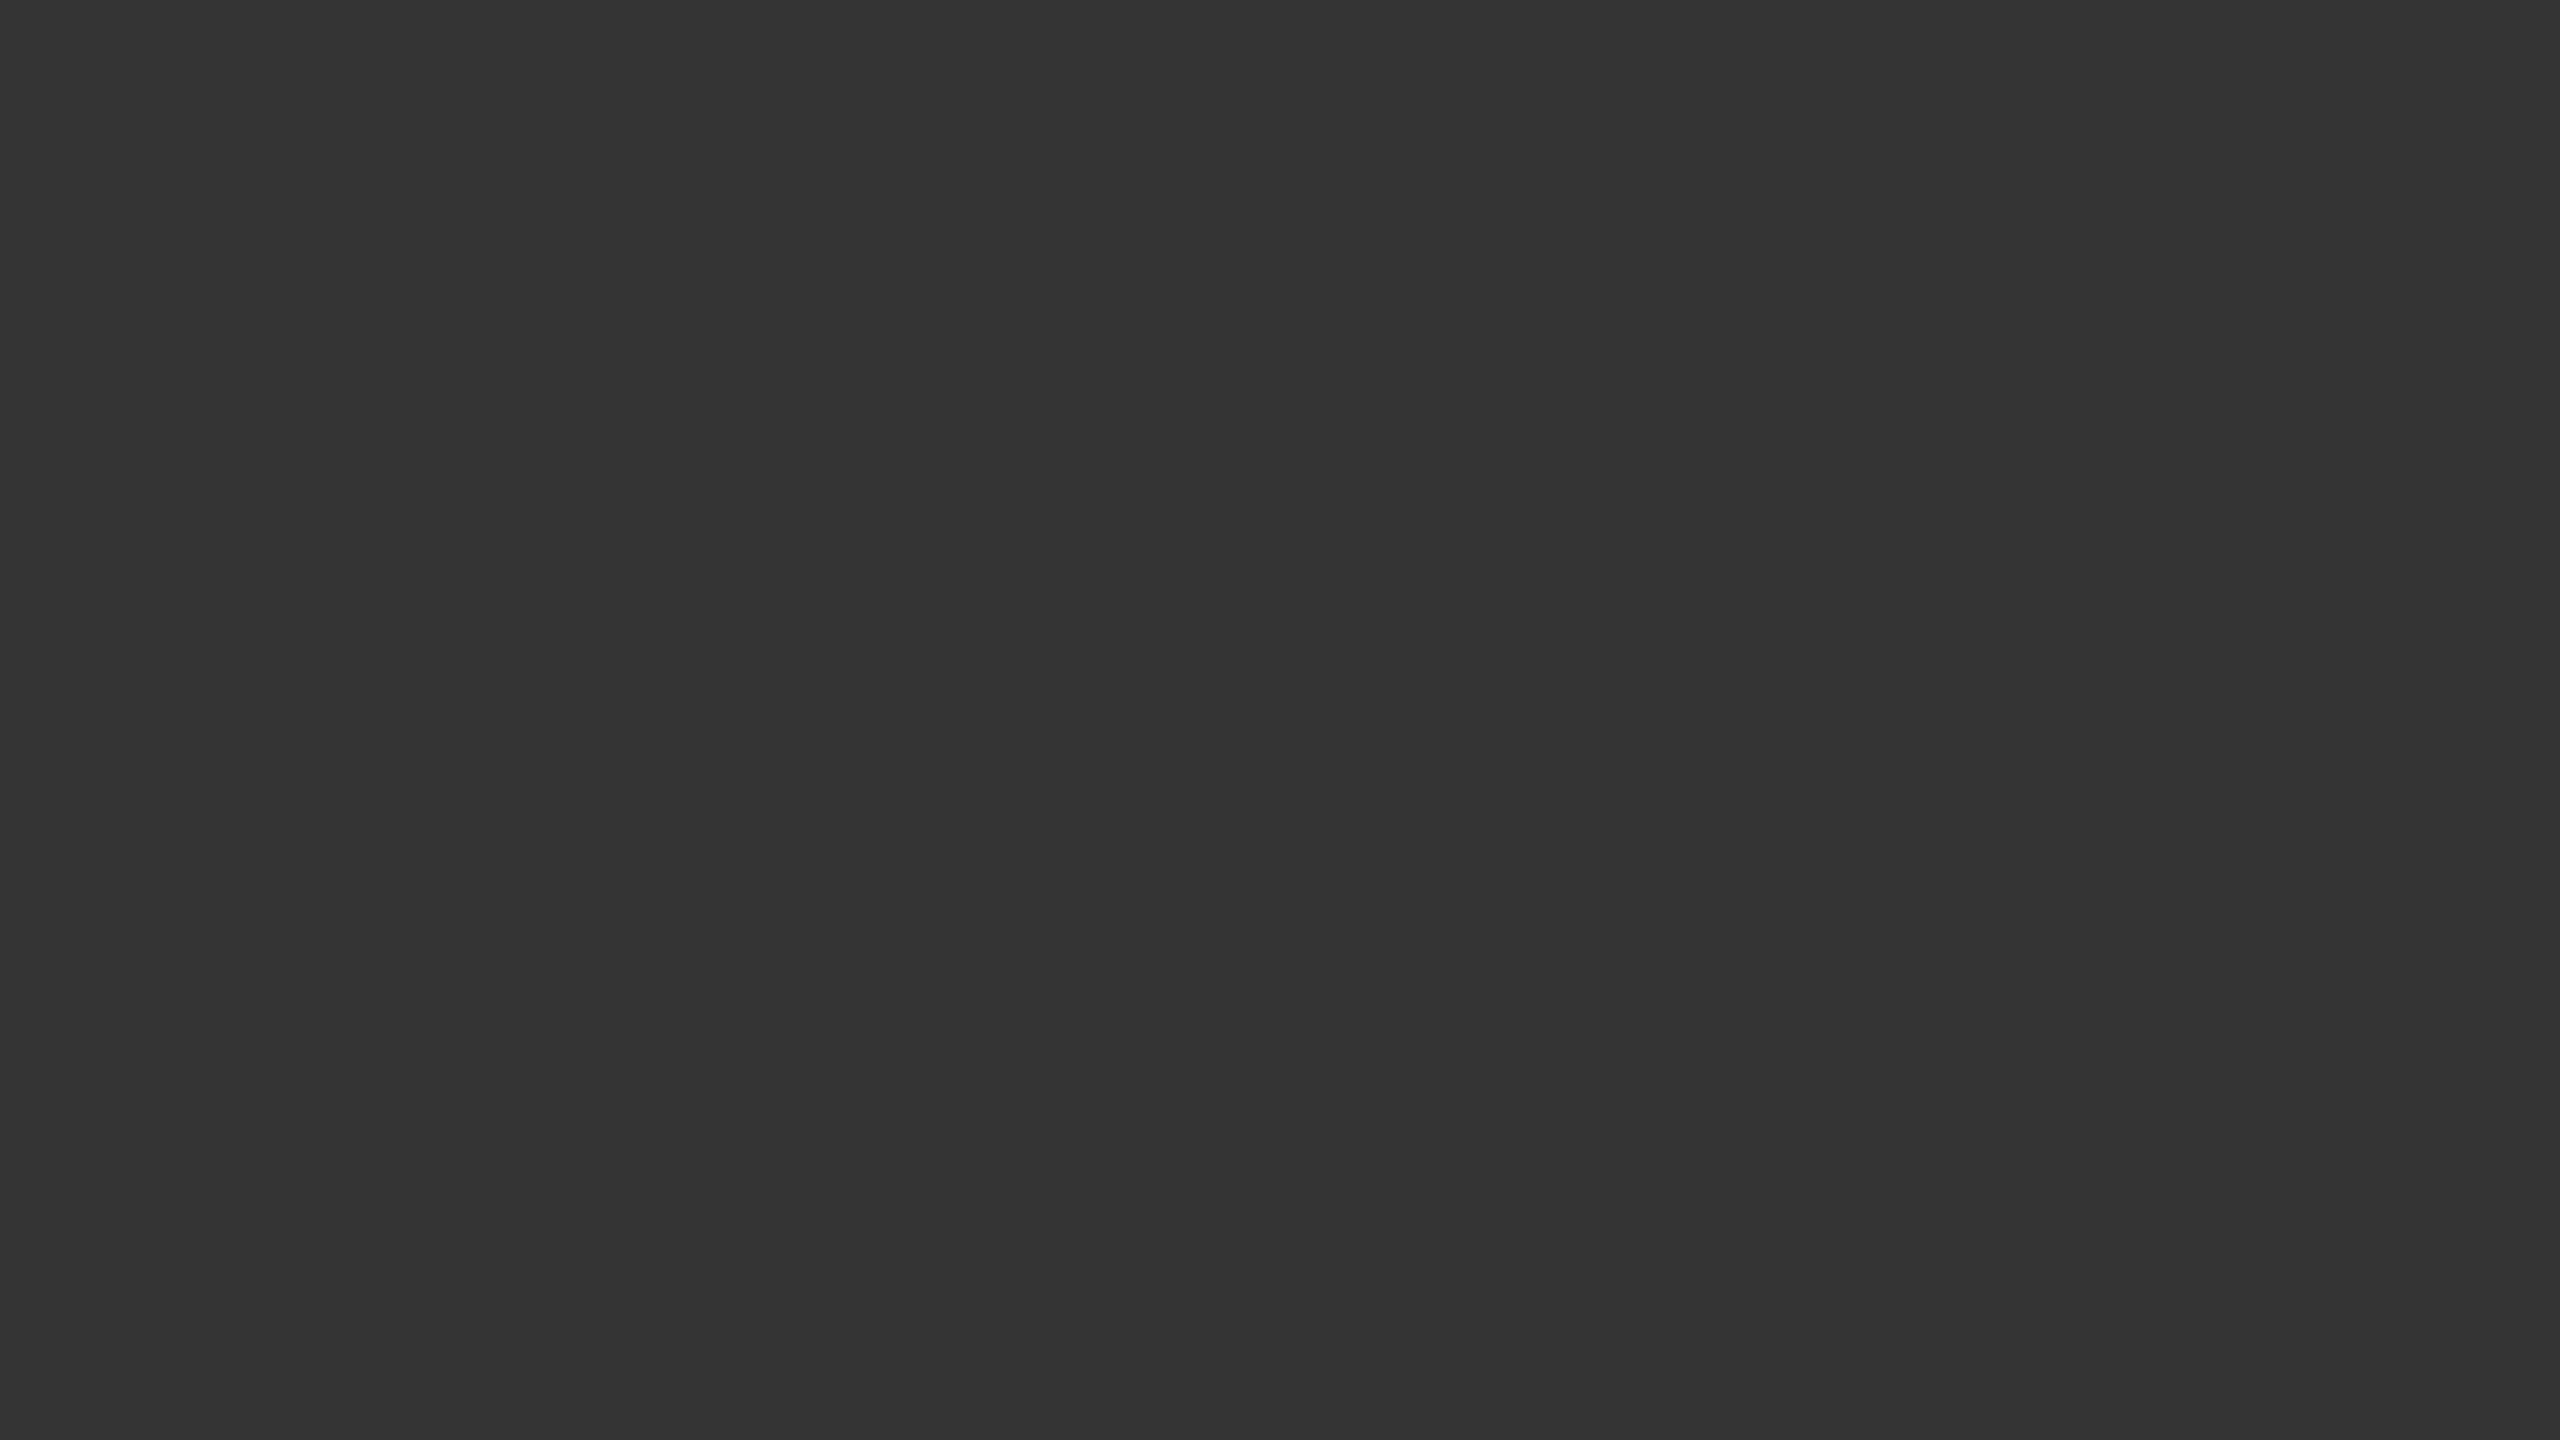 dark grey wallpaper 5D6 | Hd Wallpaper, Blue Wallpaper, Abstract Wallpaper,  Desktop Wallpaper, Pc Wallpaper, | Pinterest | Dark grey wallpaper, Dark  grey …